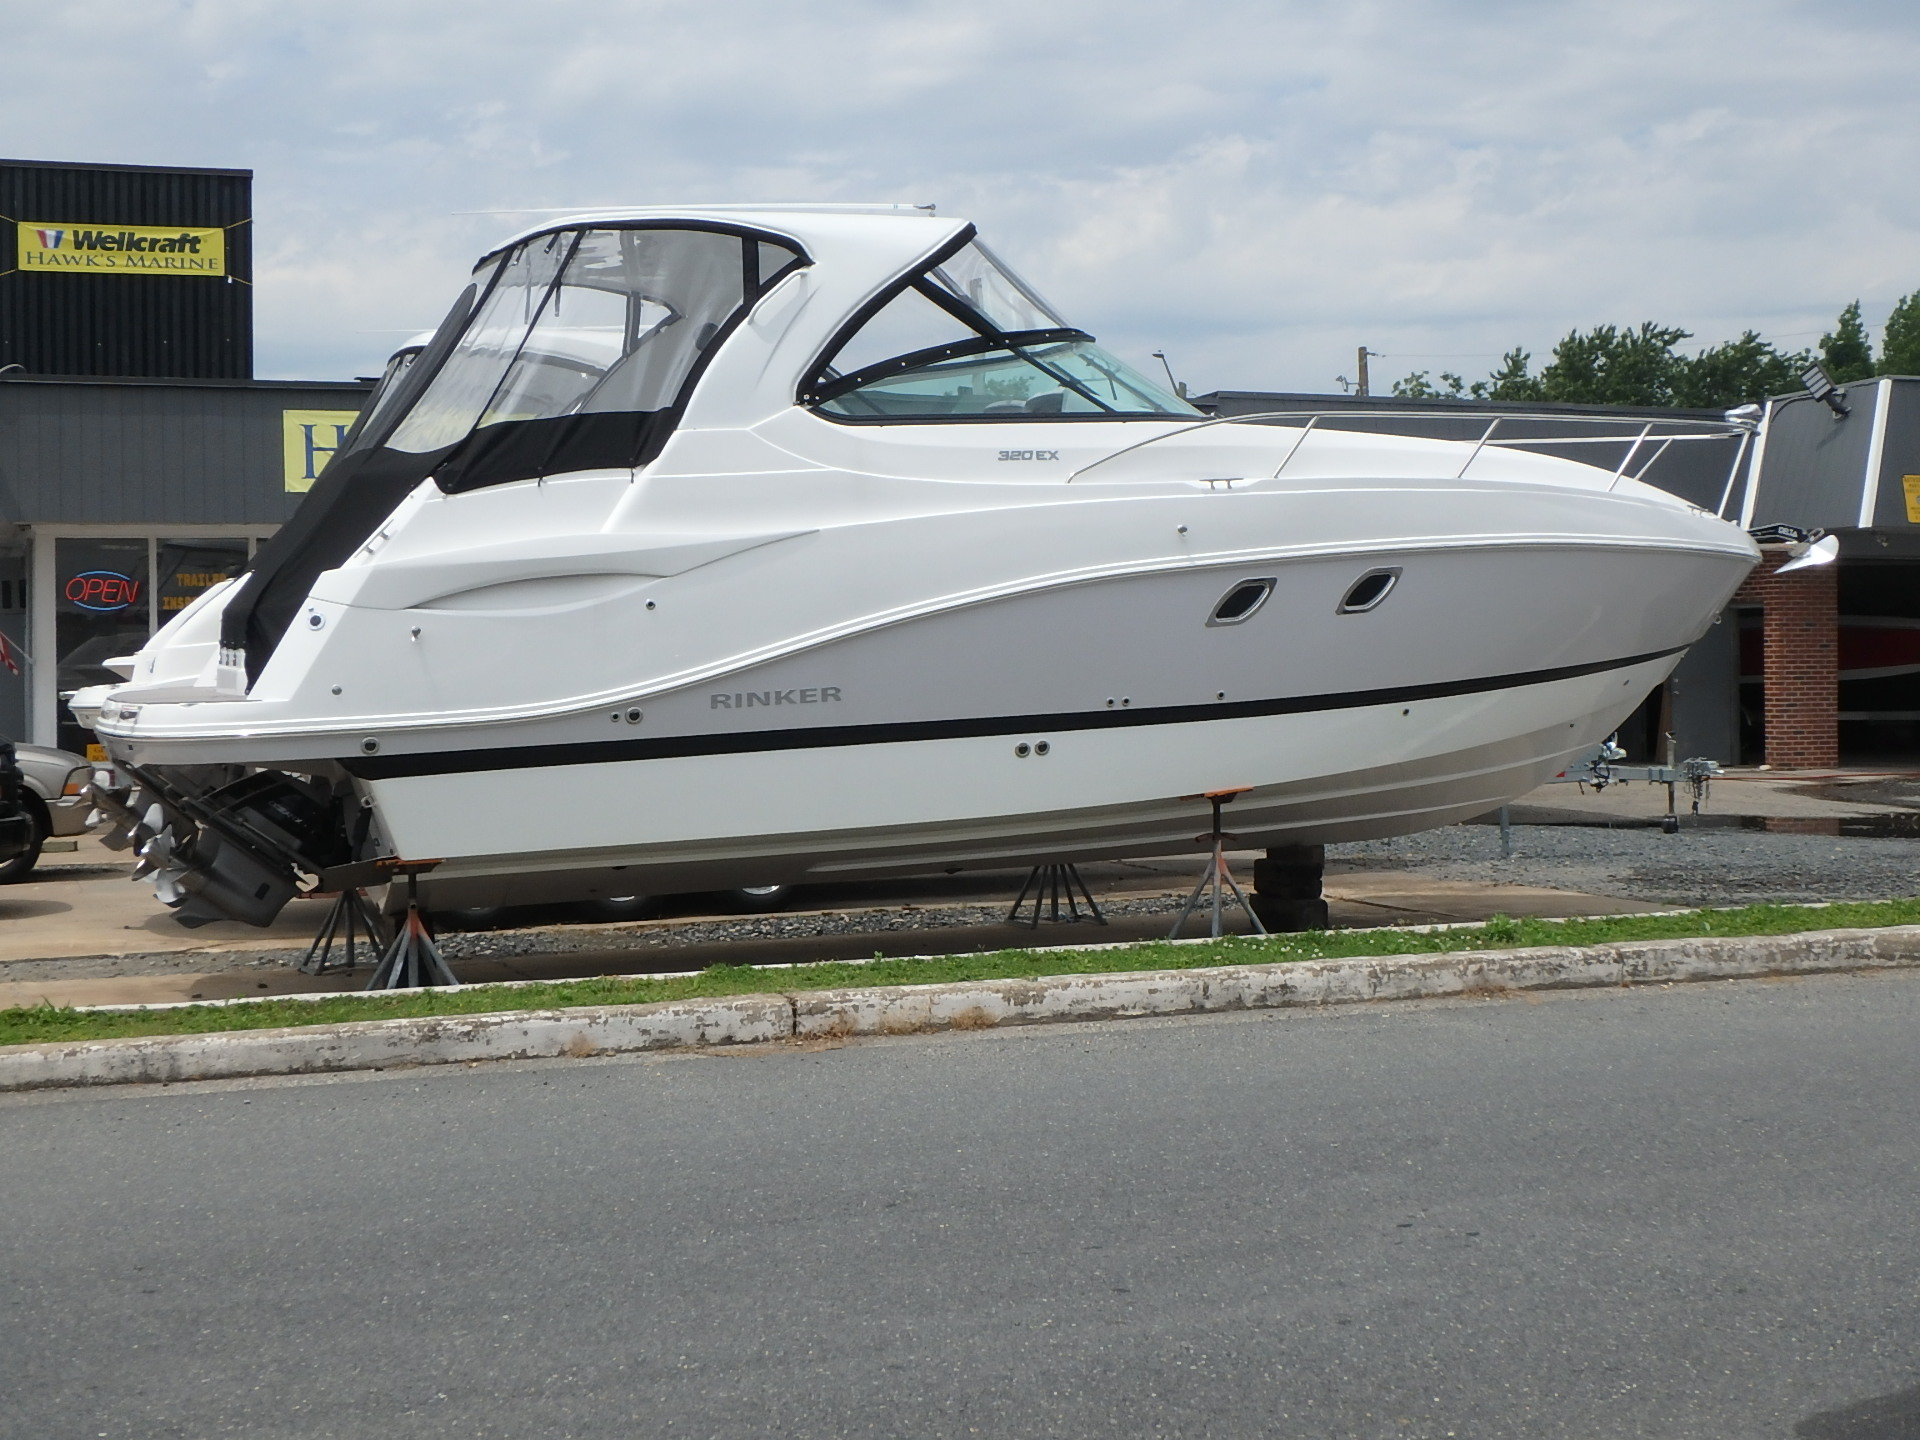 Rinker boats for sale in Maryland - Boat Trader